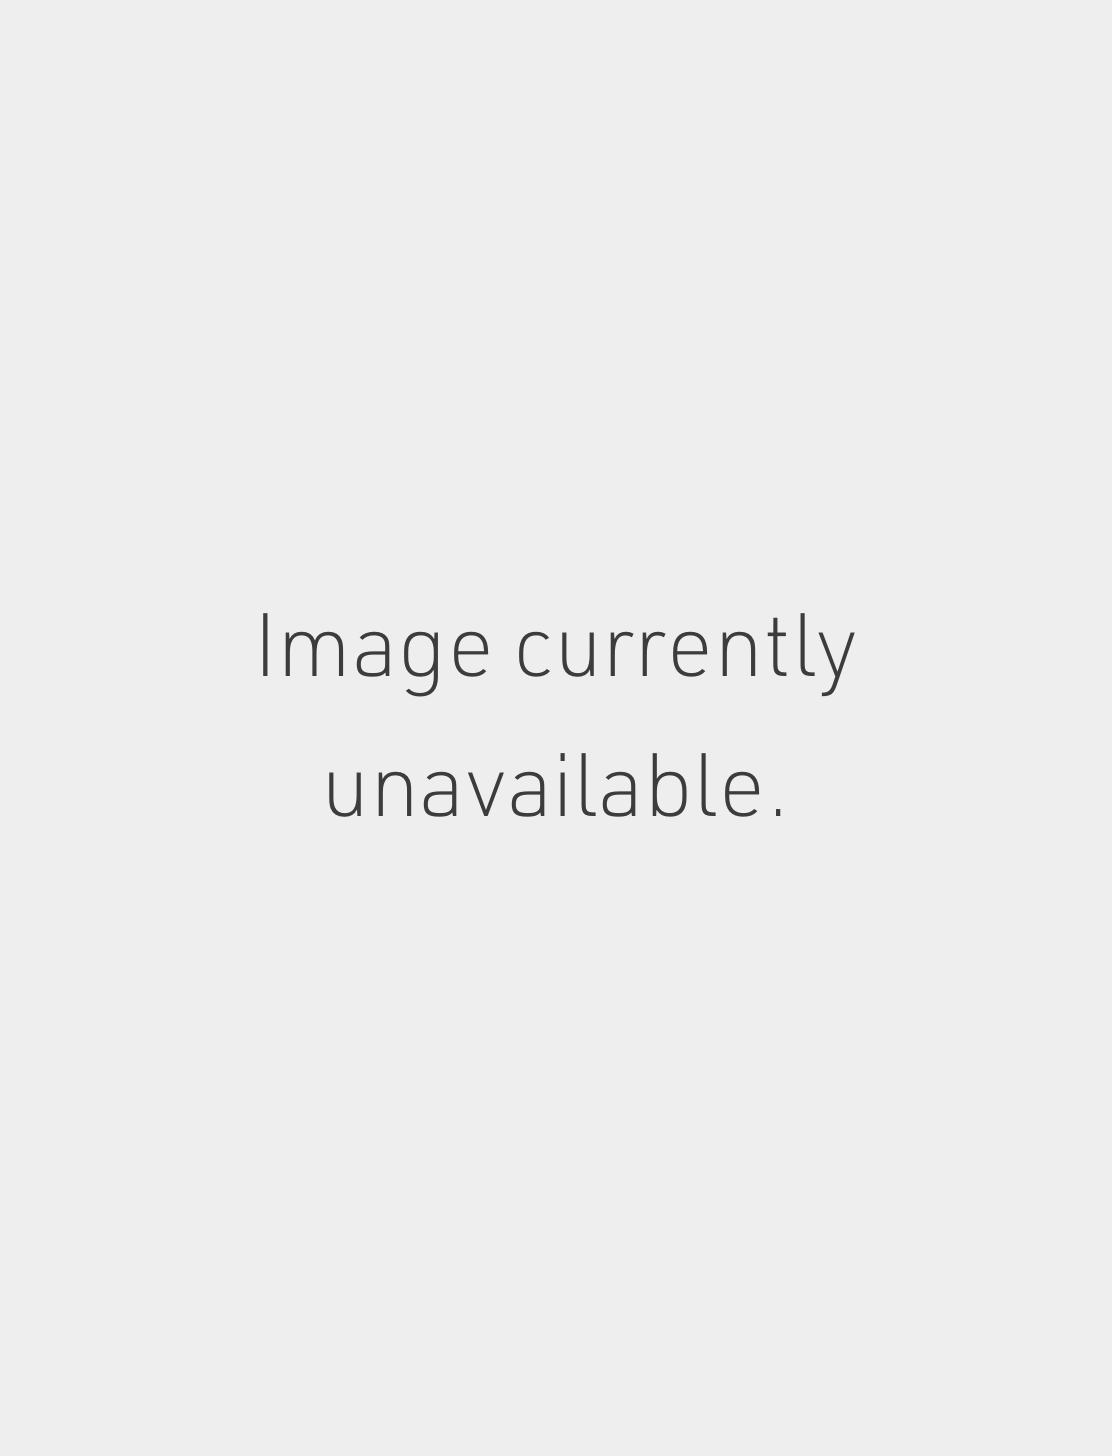 Diamond Lucky Clover Nostril Screw - WHITE GOLD - LEFT Image #1